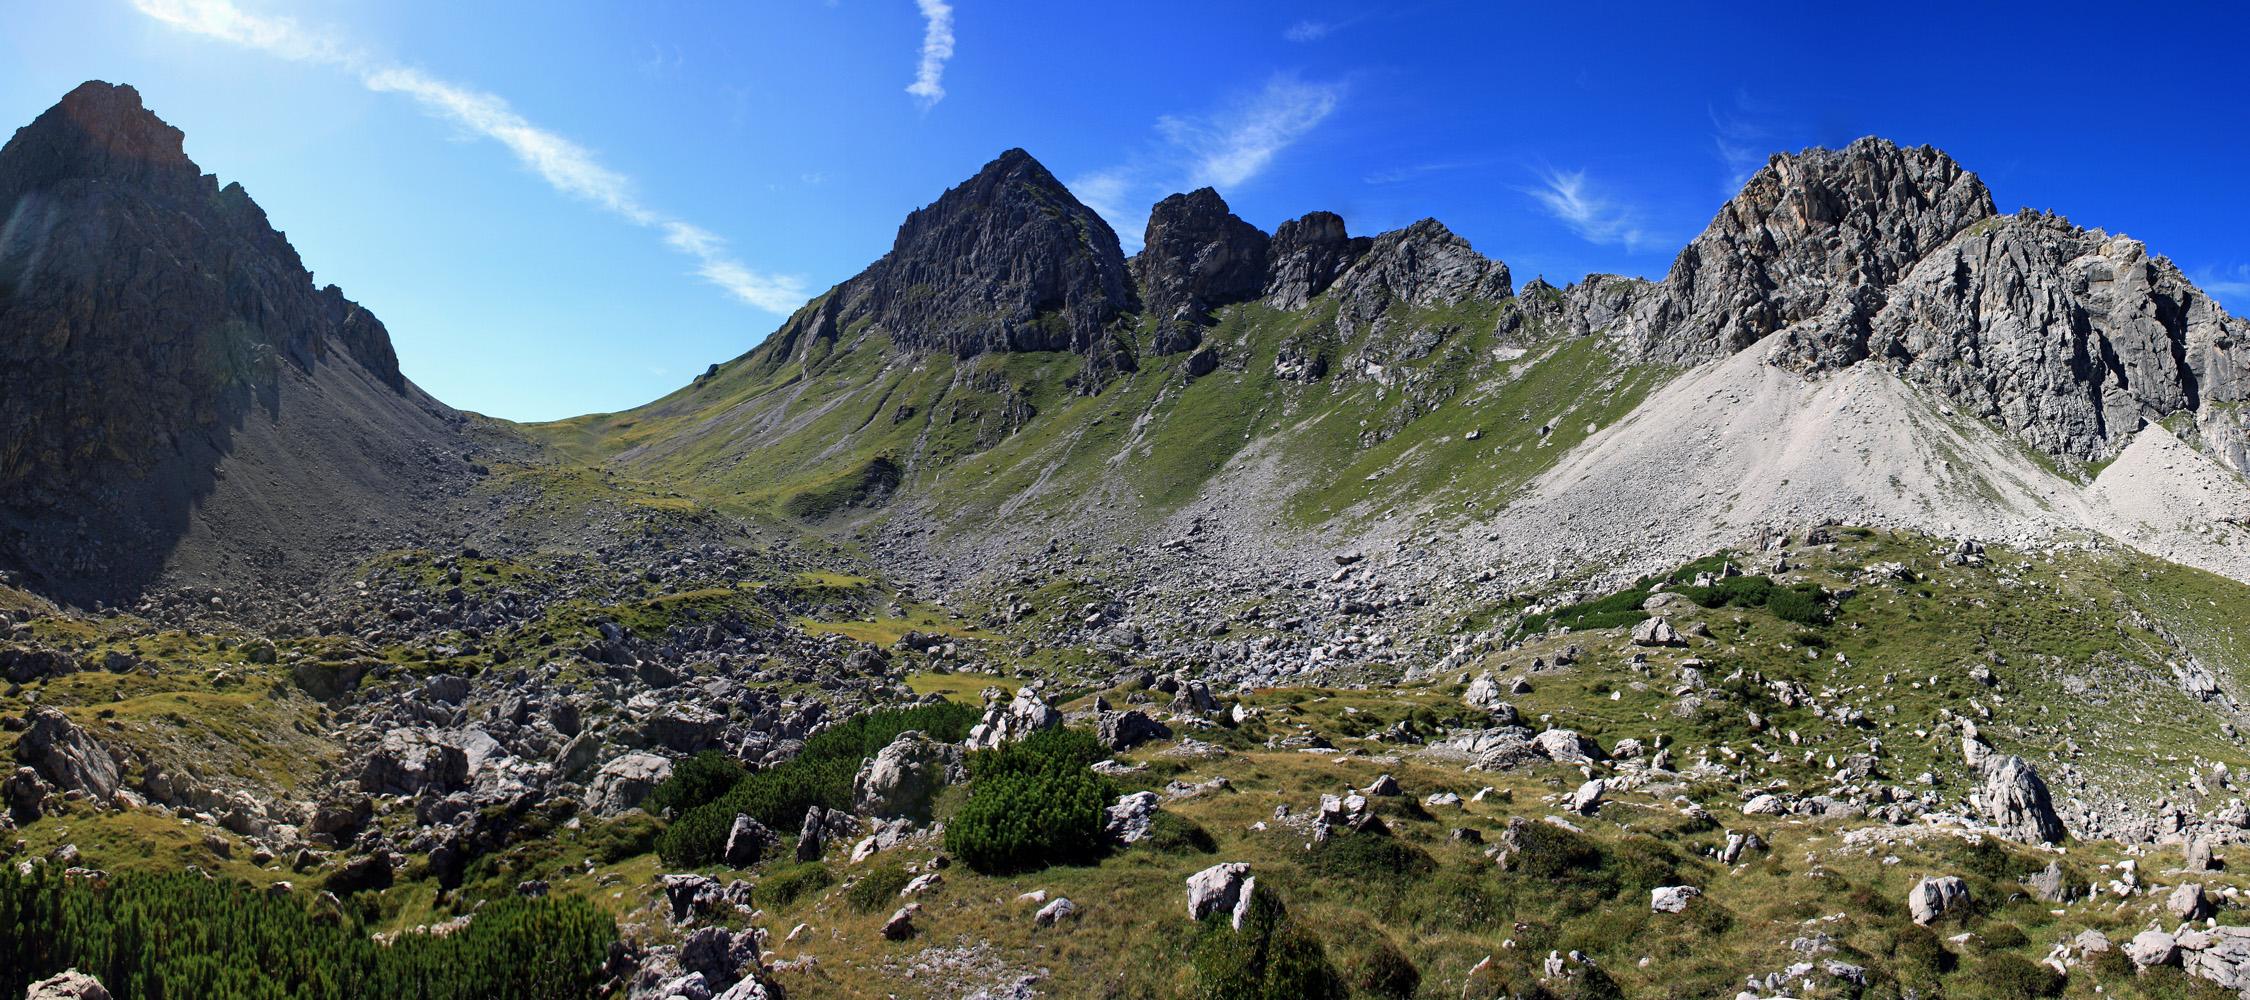 Alblitjöchl - Lechtaler Alpen!